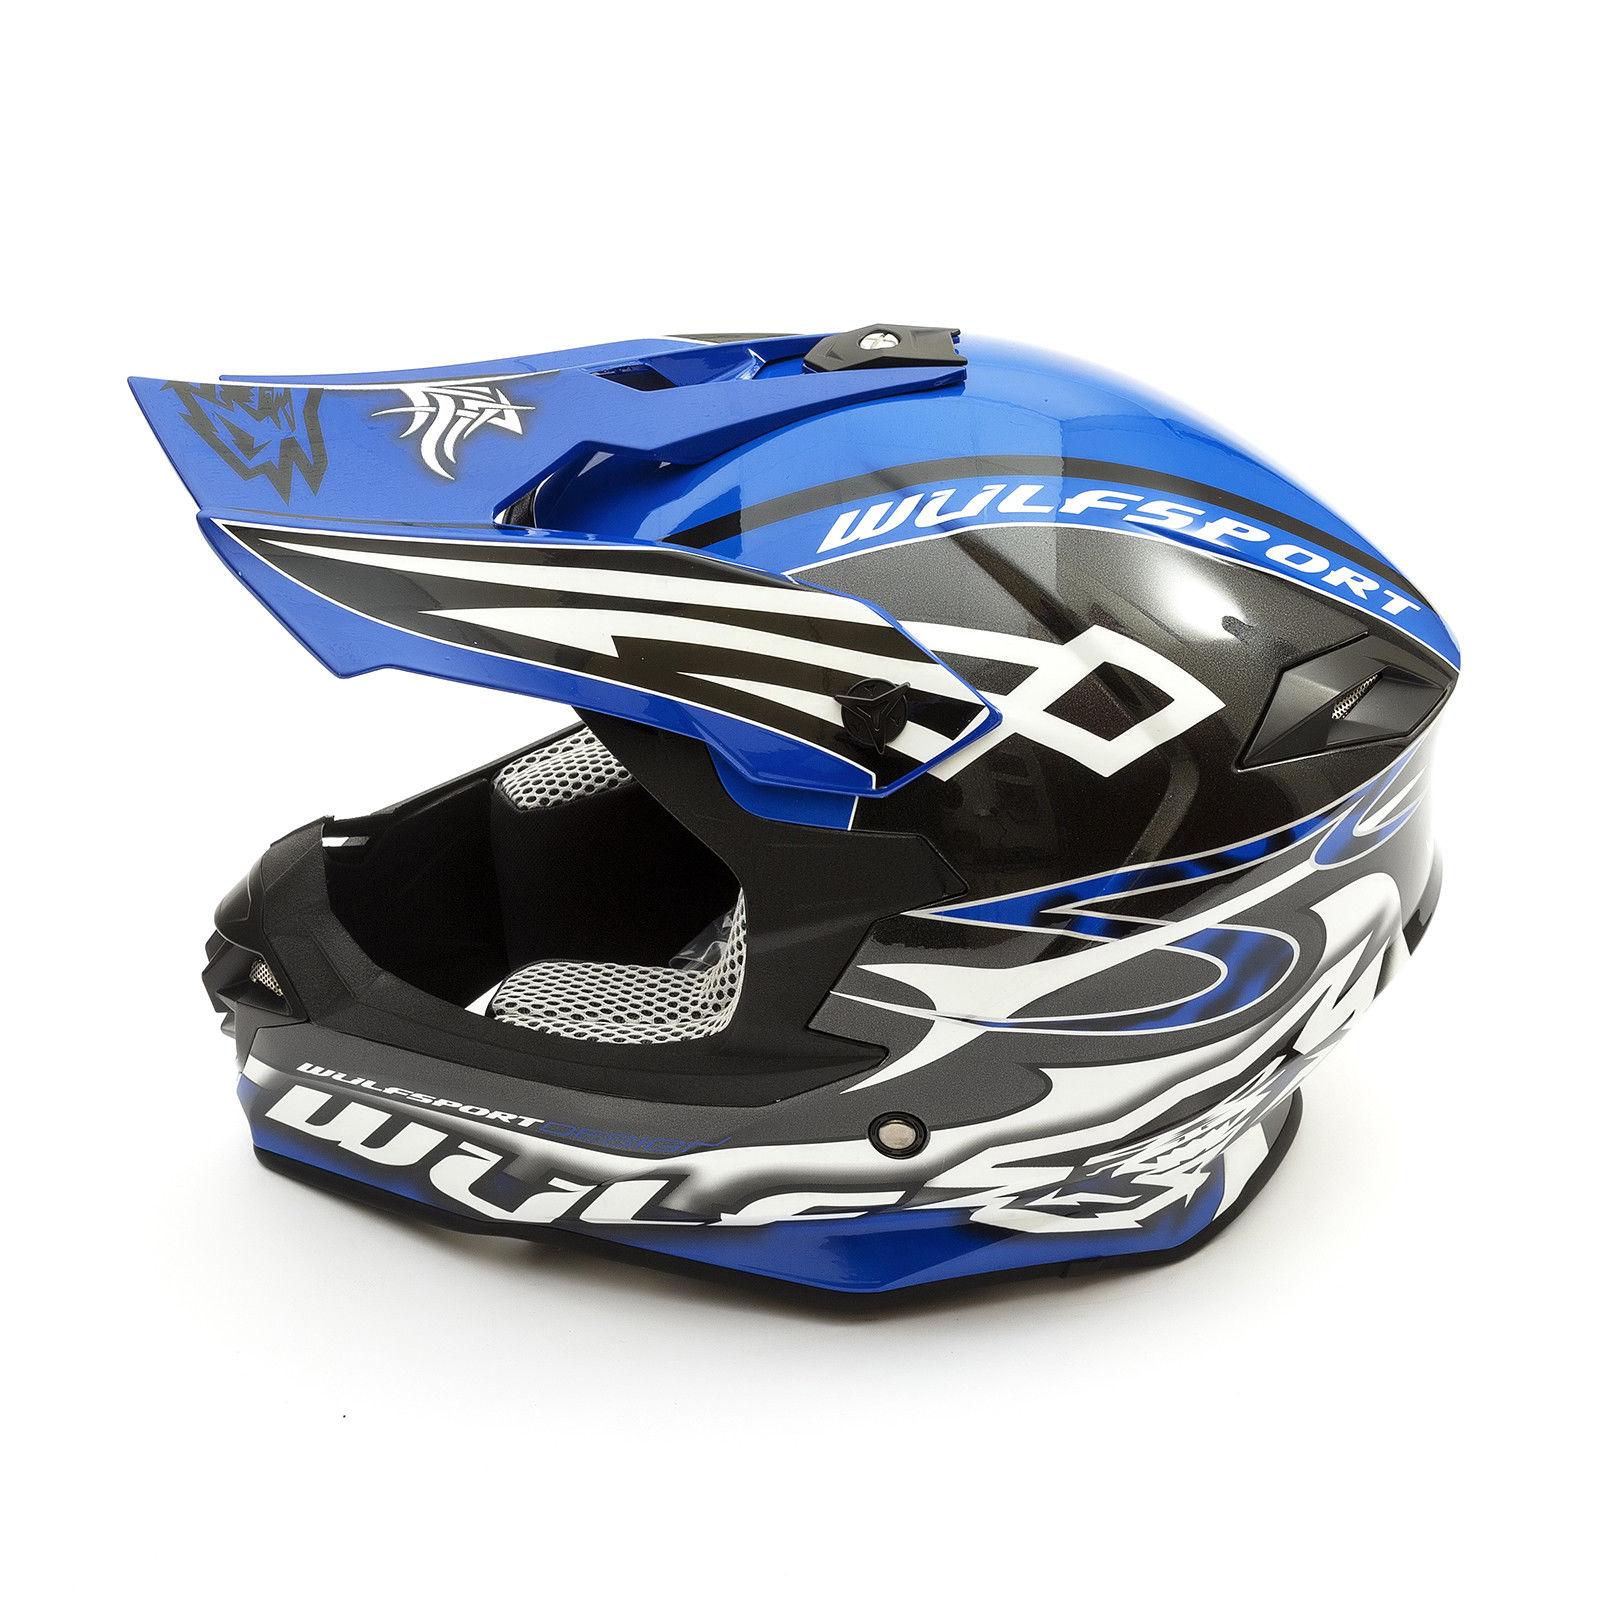 Wulfsport-Adult-Sceptre-Helmets-Motocross-Pitbike-Motorbike-Off-Road-Racing-ATV thumbnail 16